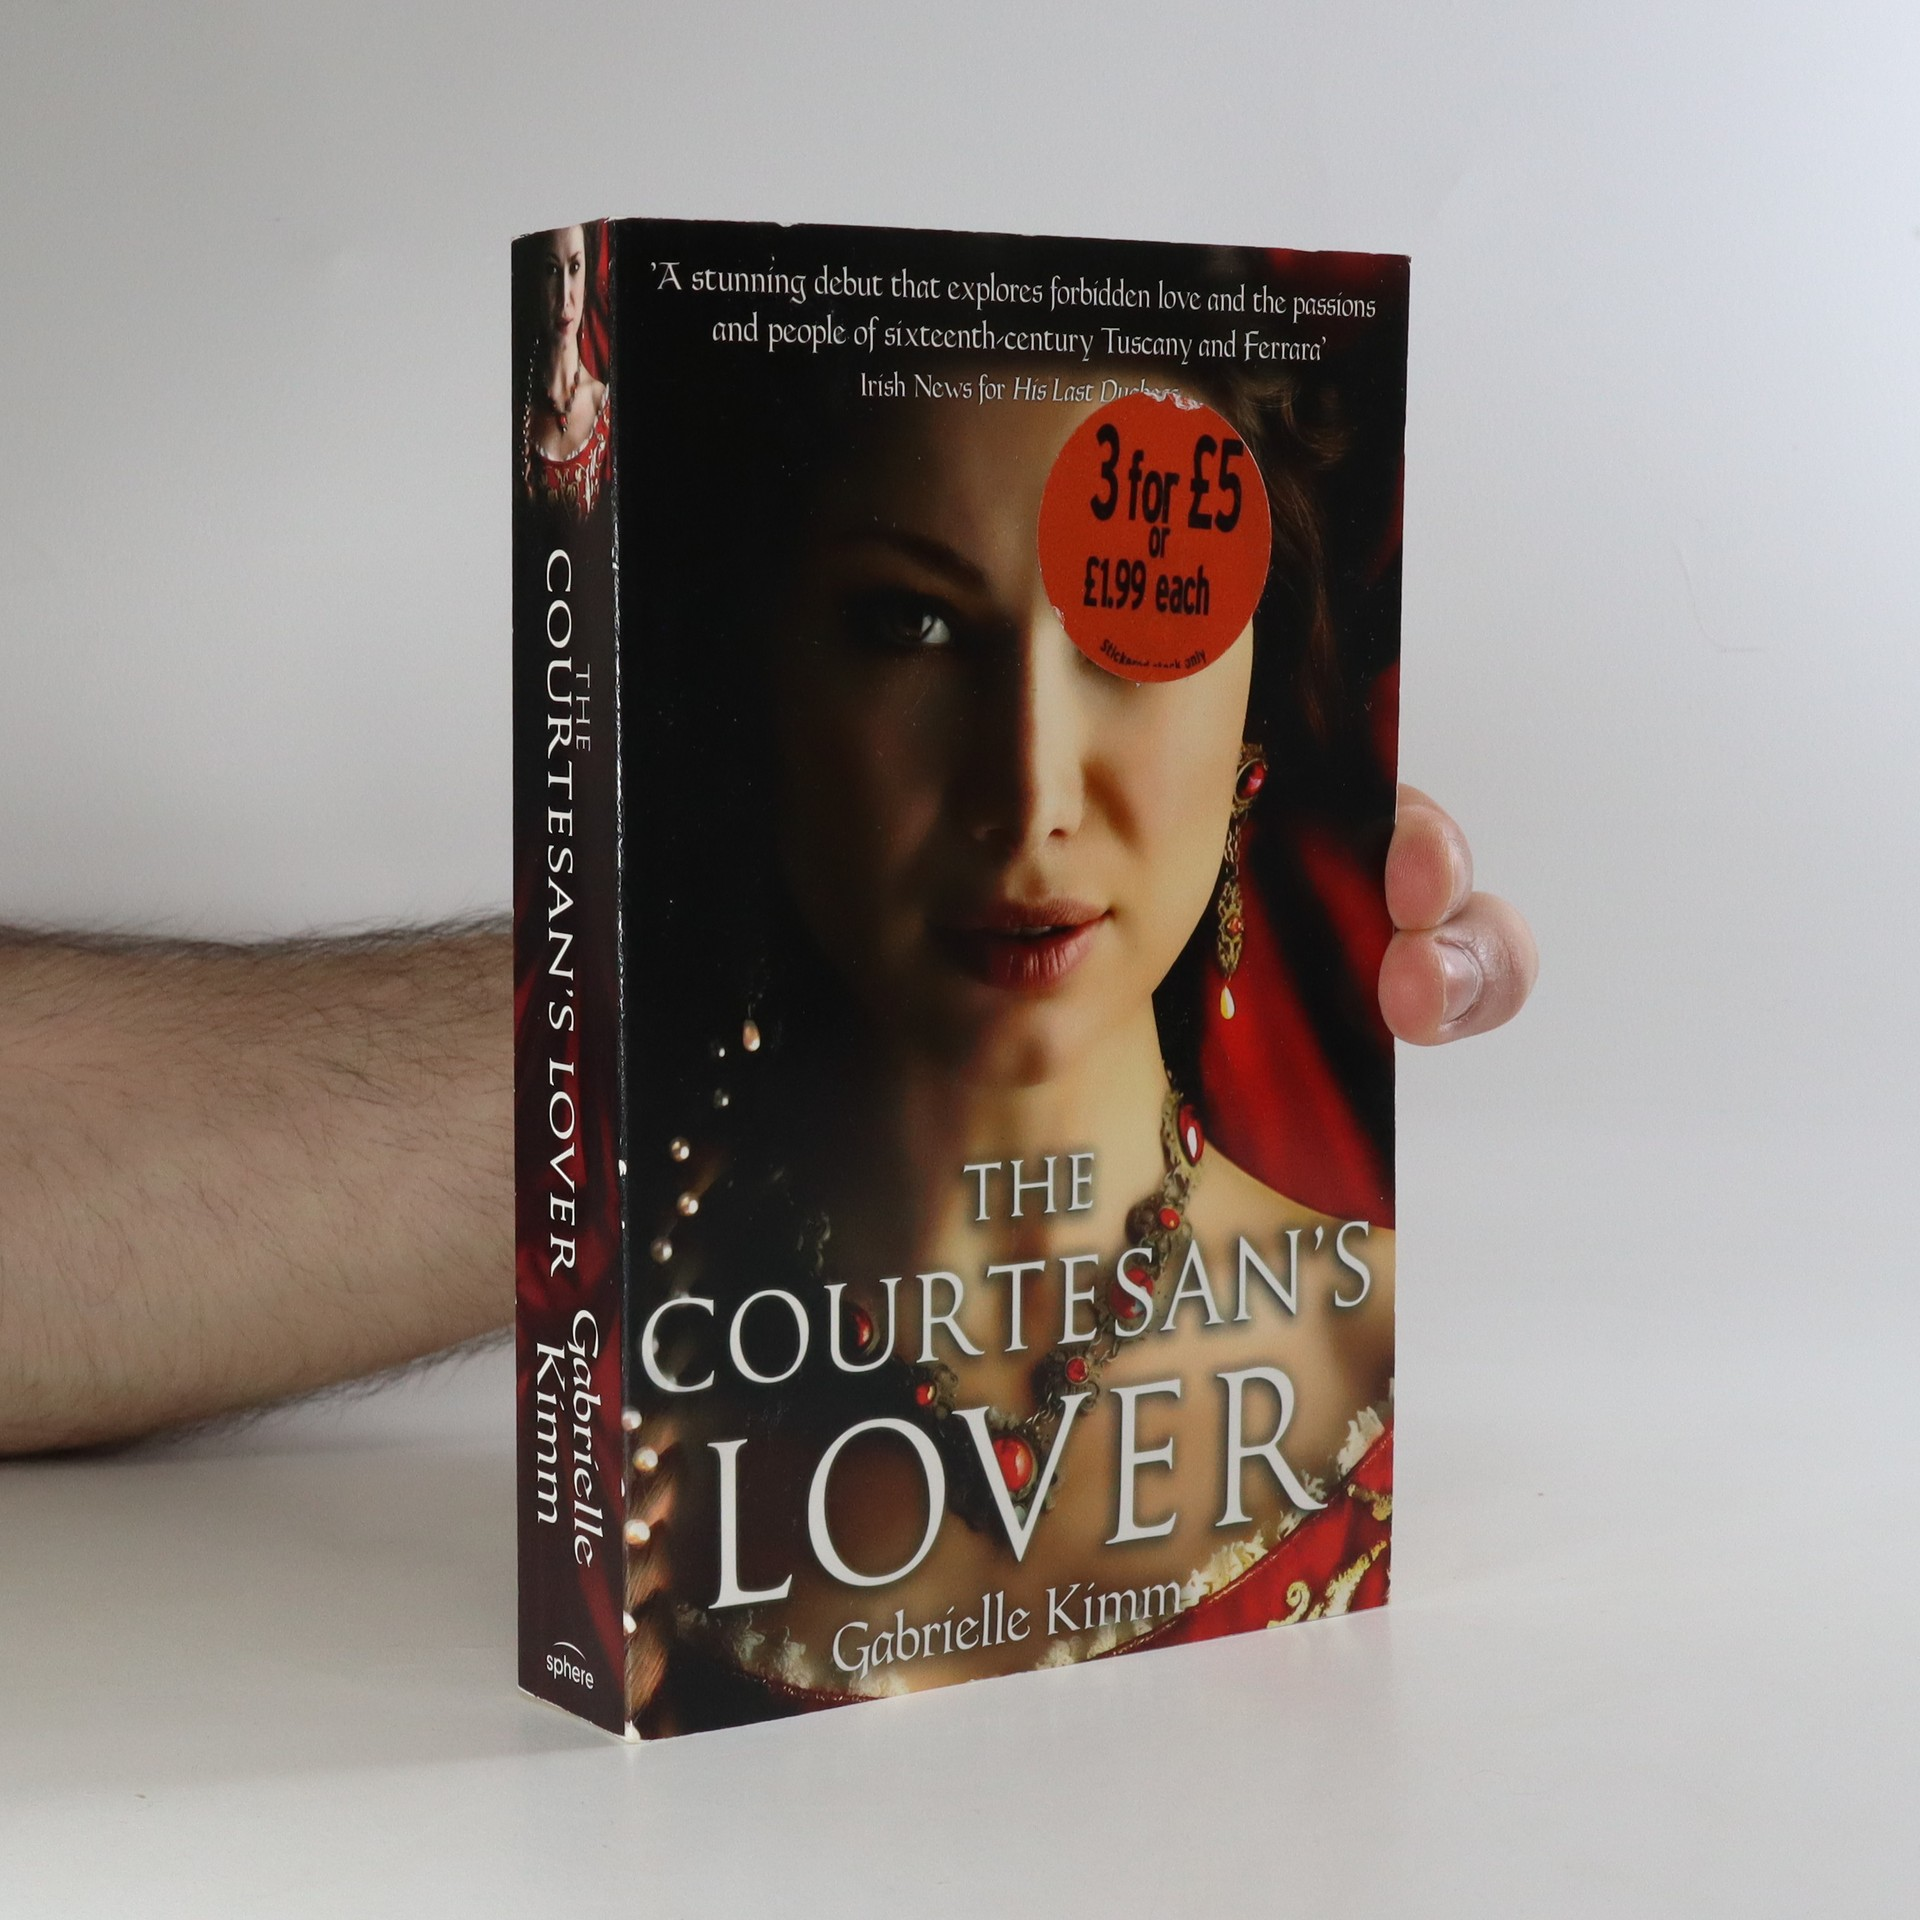 antikvární kniha The courtesan's lover, 2013